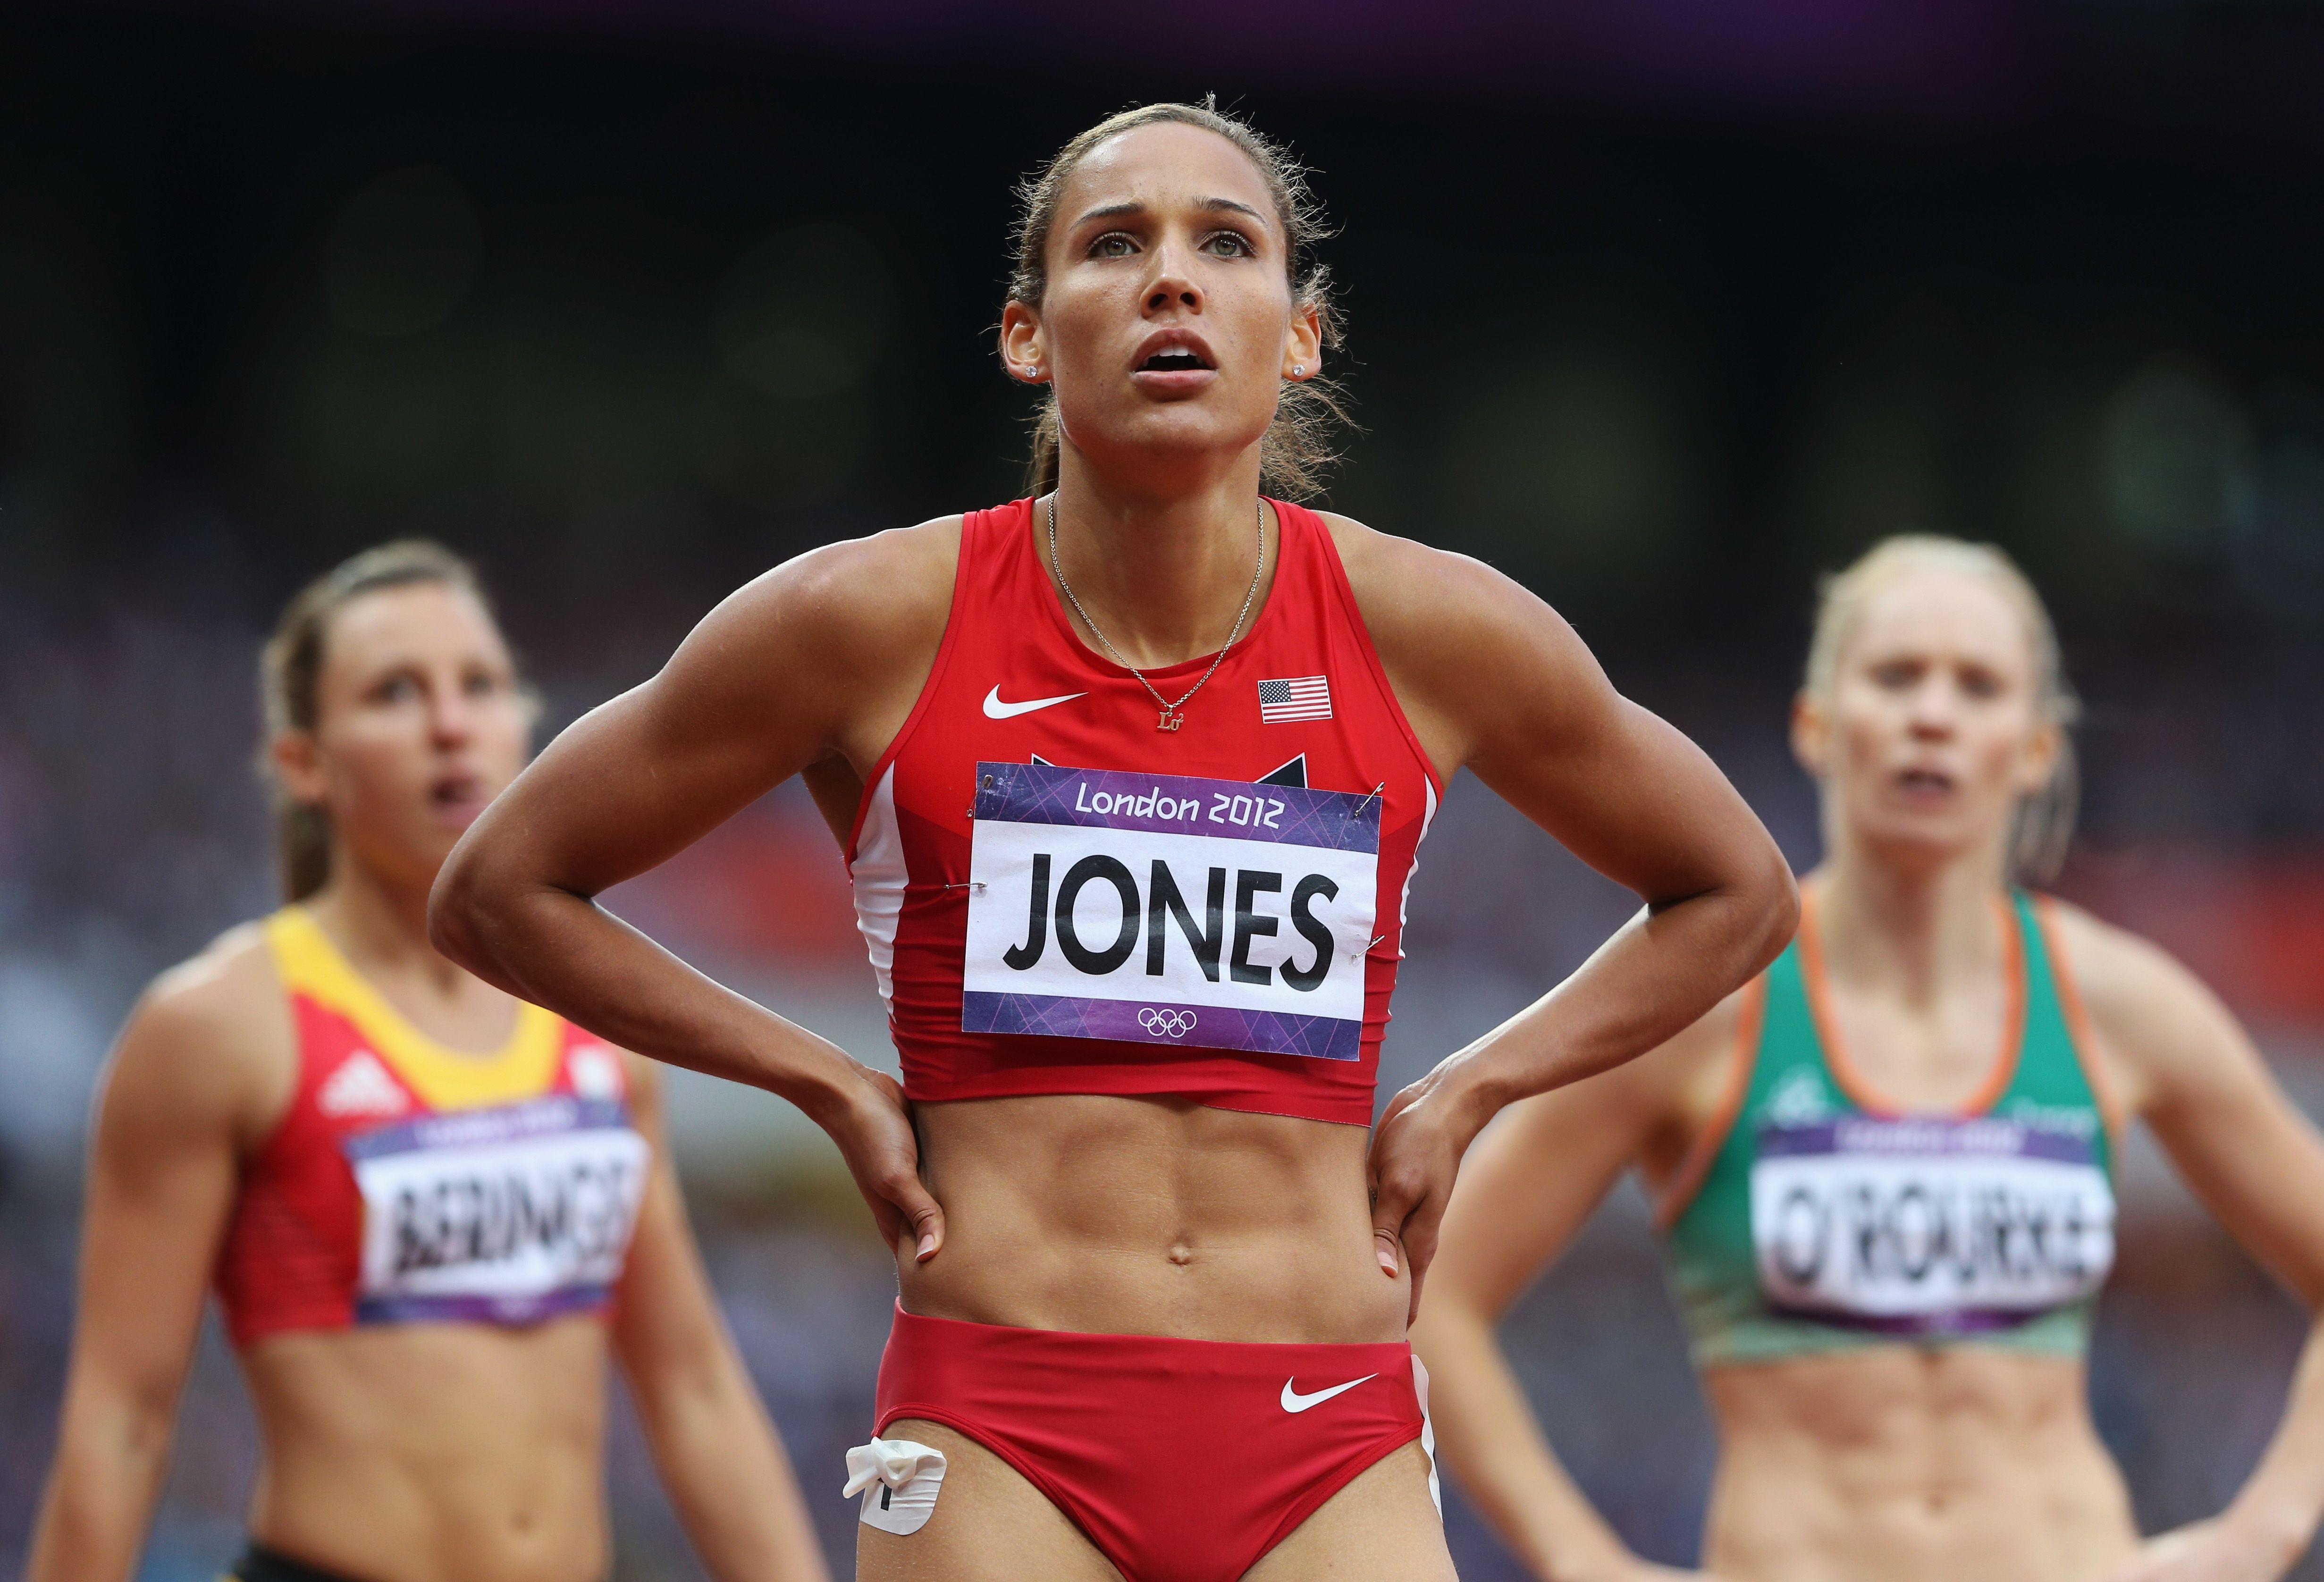 olympic hurdler jones crossword - HD4924×3352